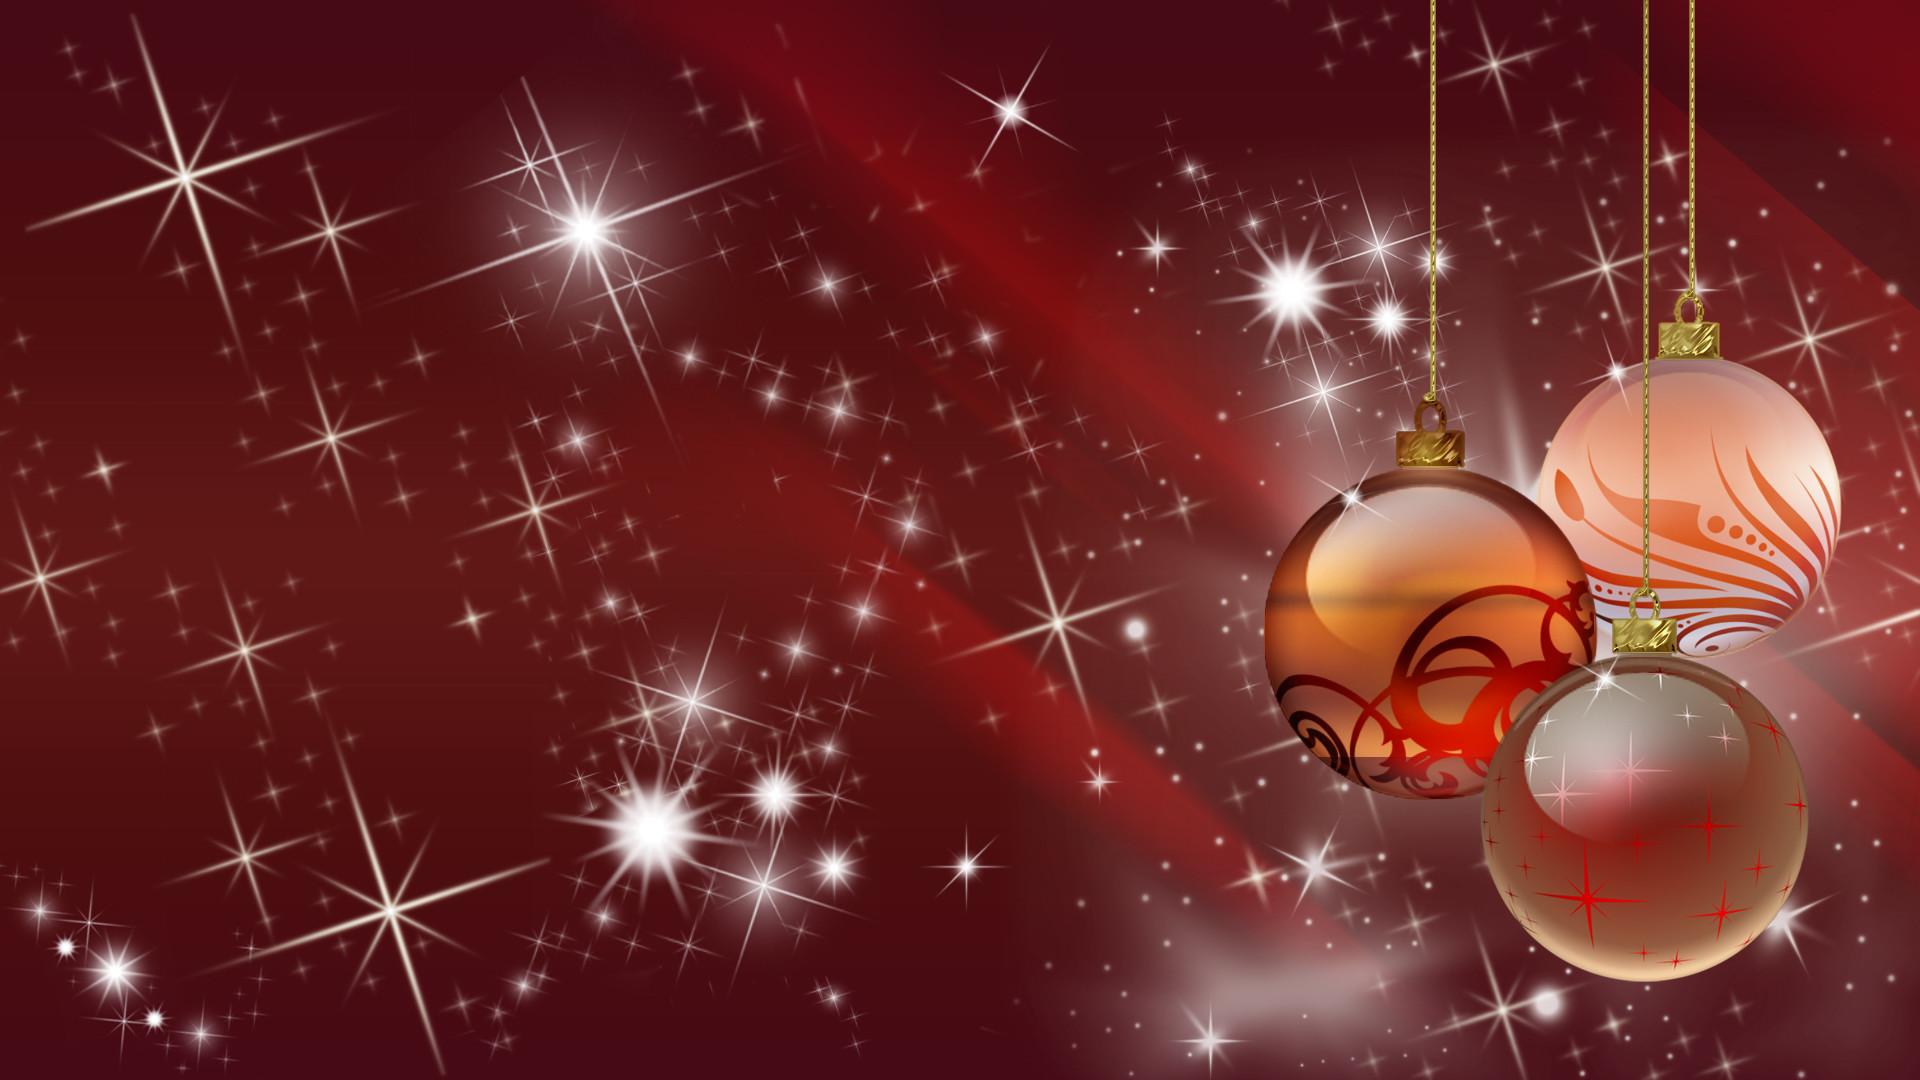 Christian Christmas Desktop Wallpaper